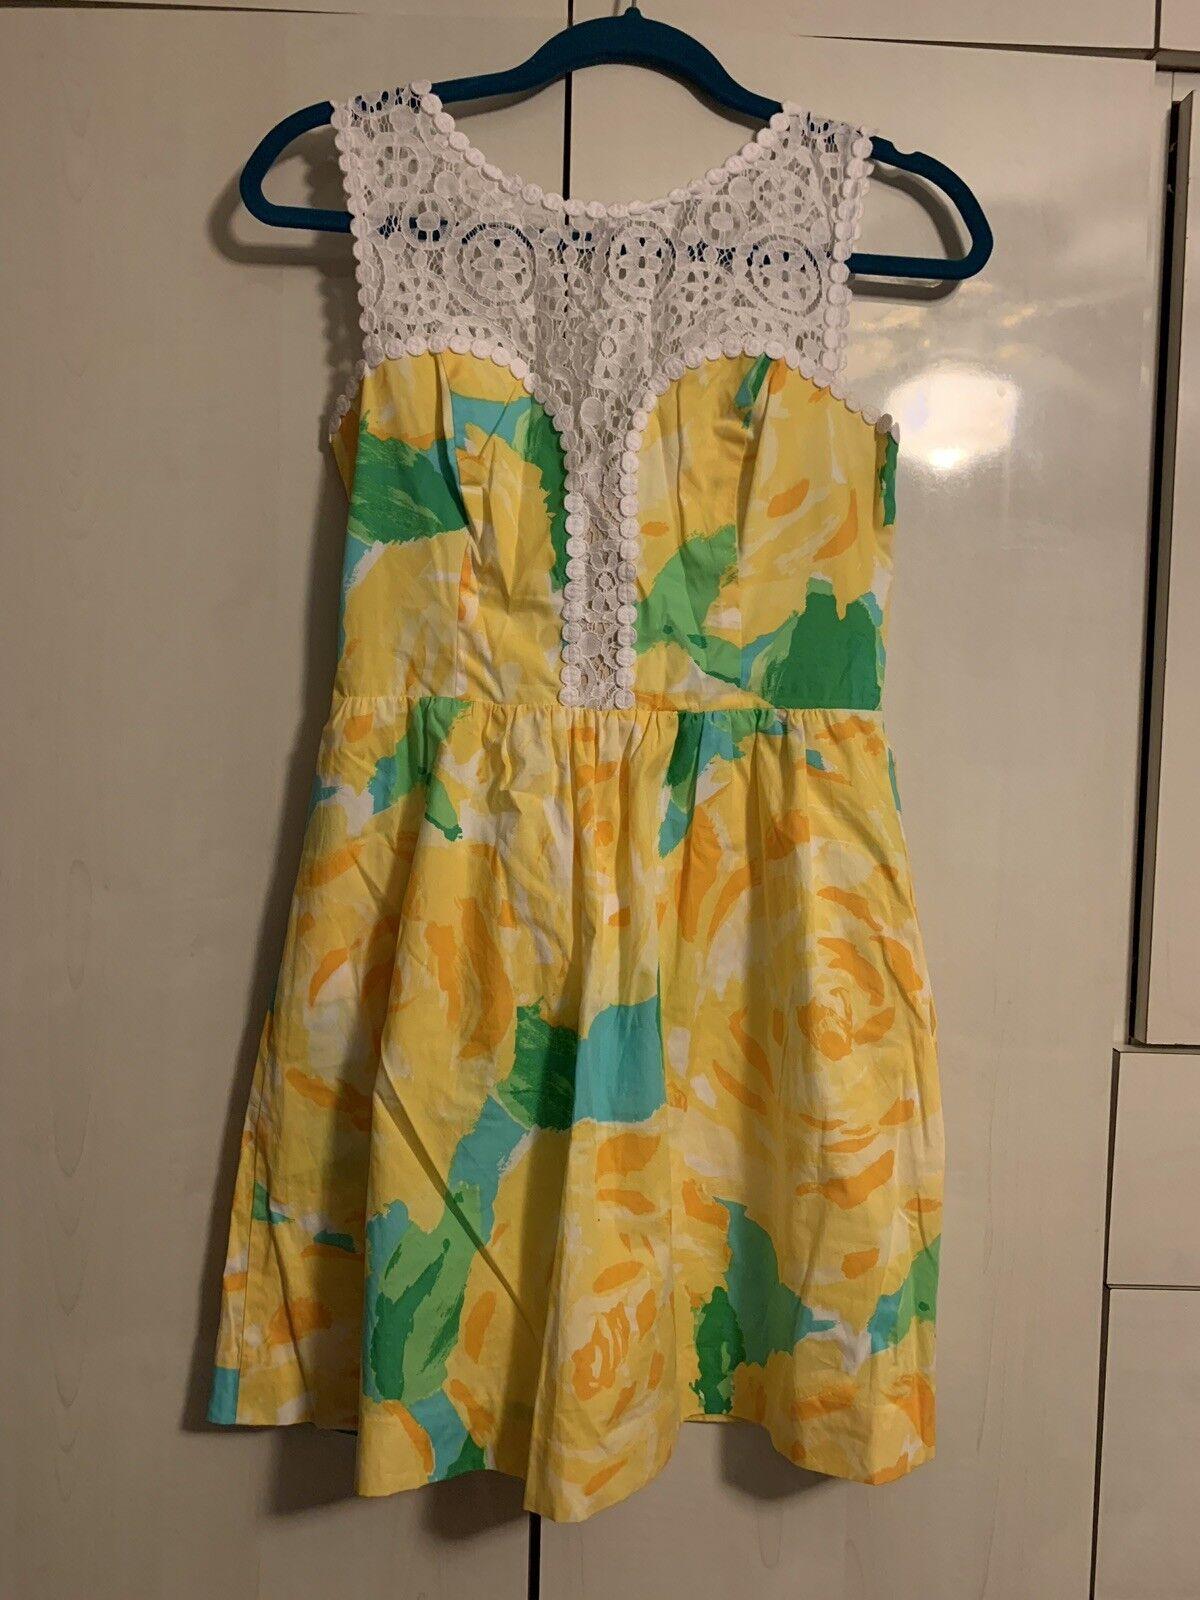 Lilly Pulitzer 2 Raegan Fit & Flare Dress, Sunglow Gelb First Impression, NWOT